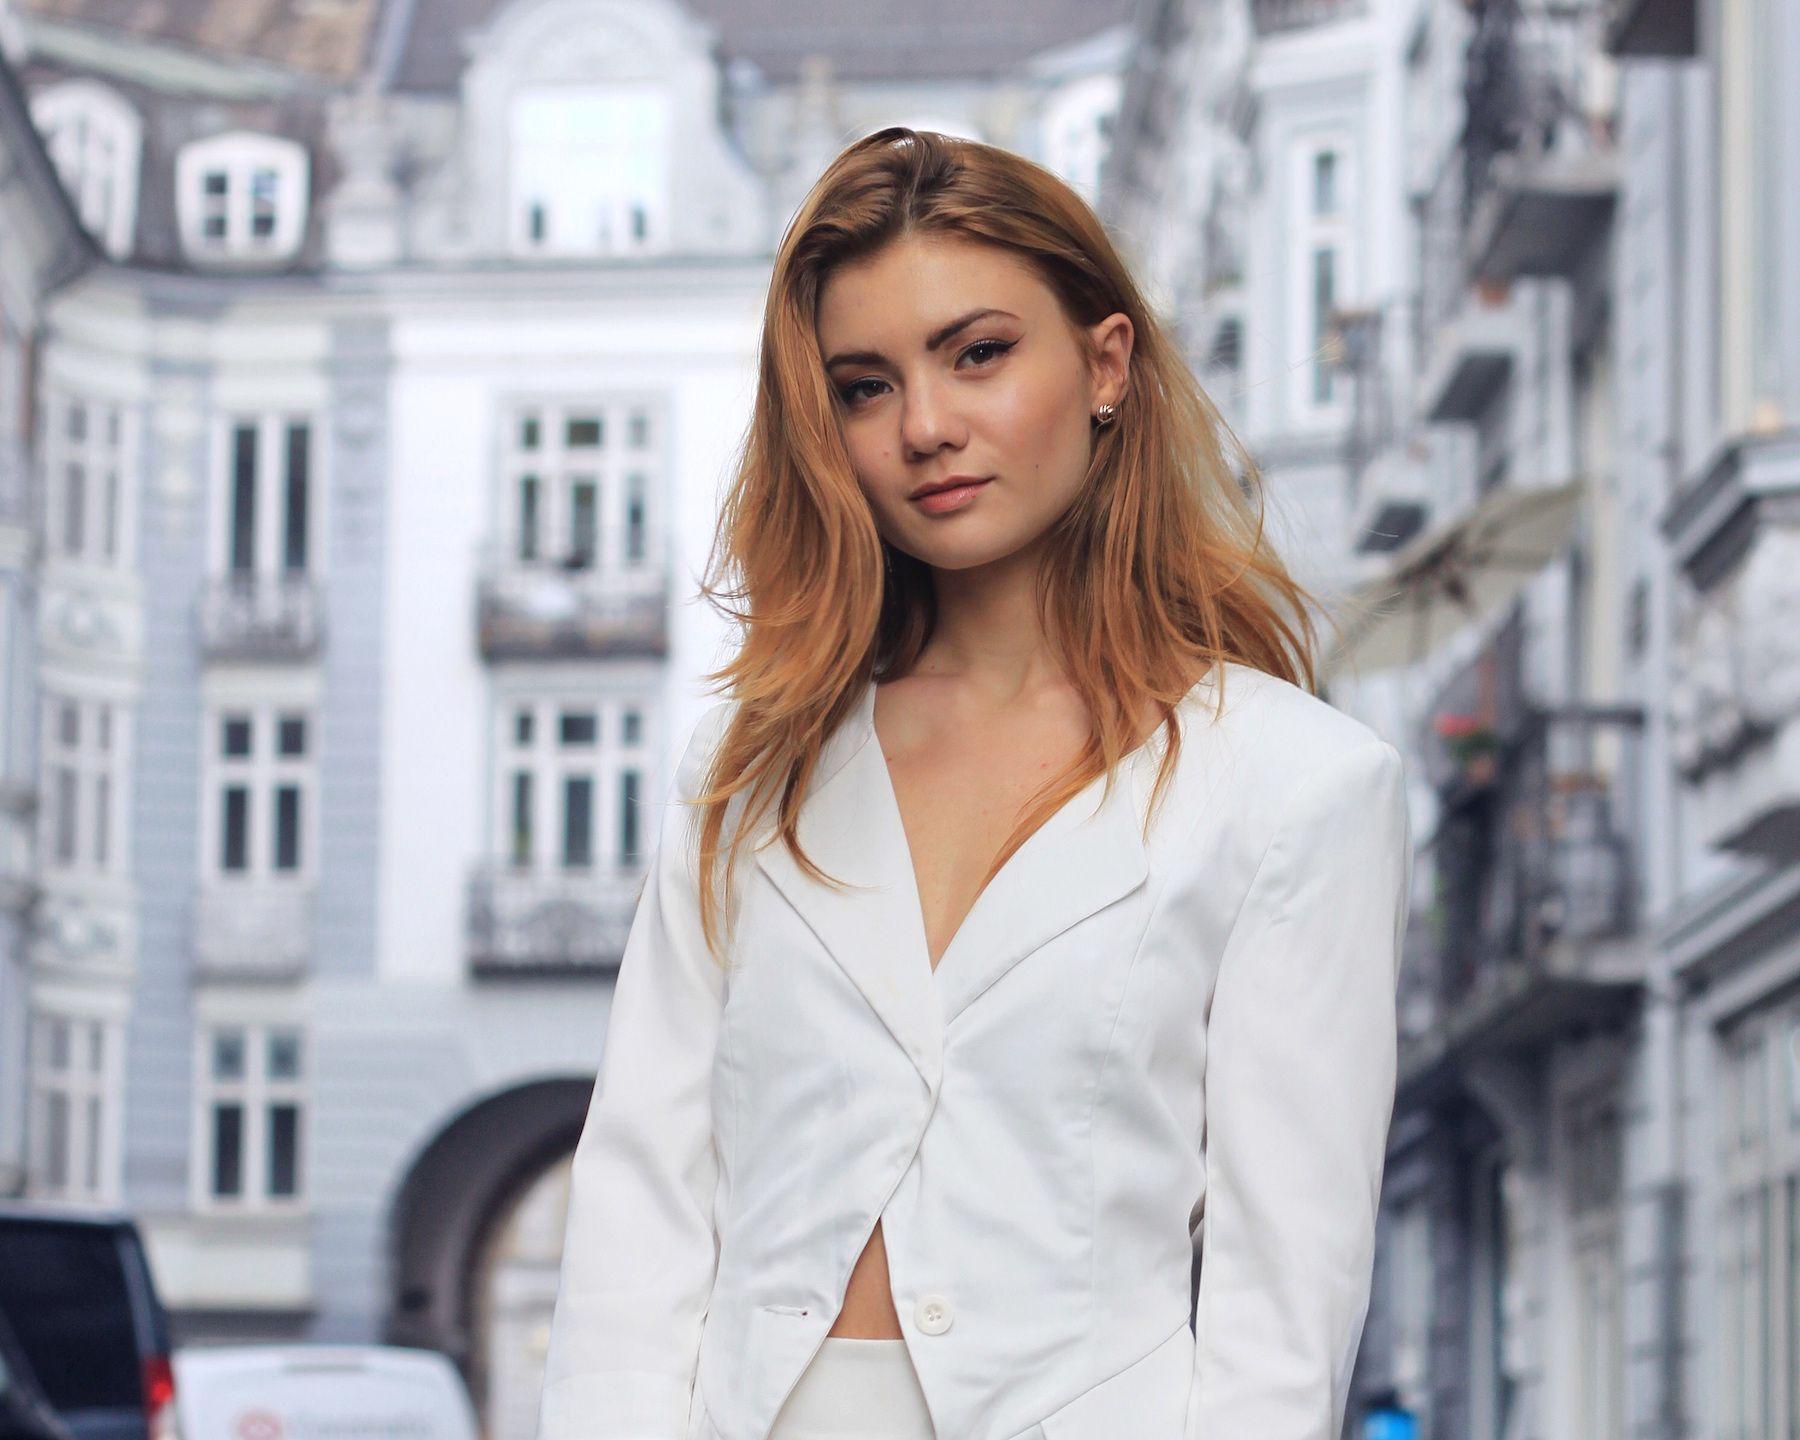 Juliana Chow Fashion Lifestyle Blogger Copenhagen Blog Personal Style